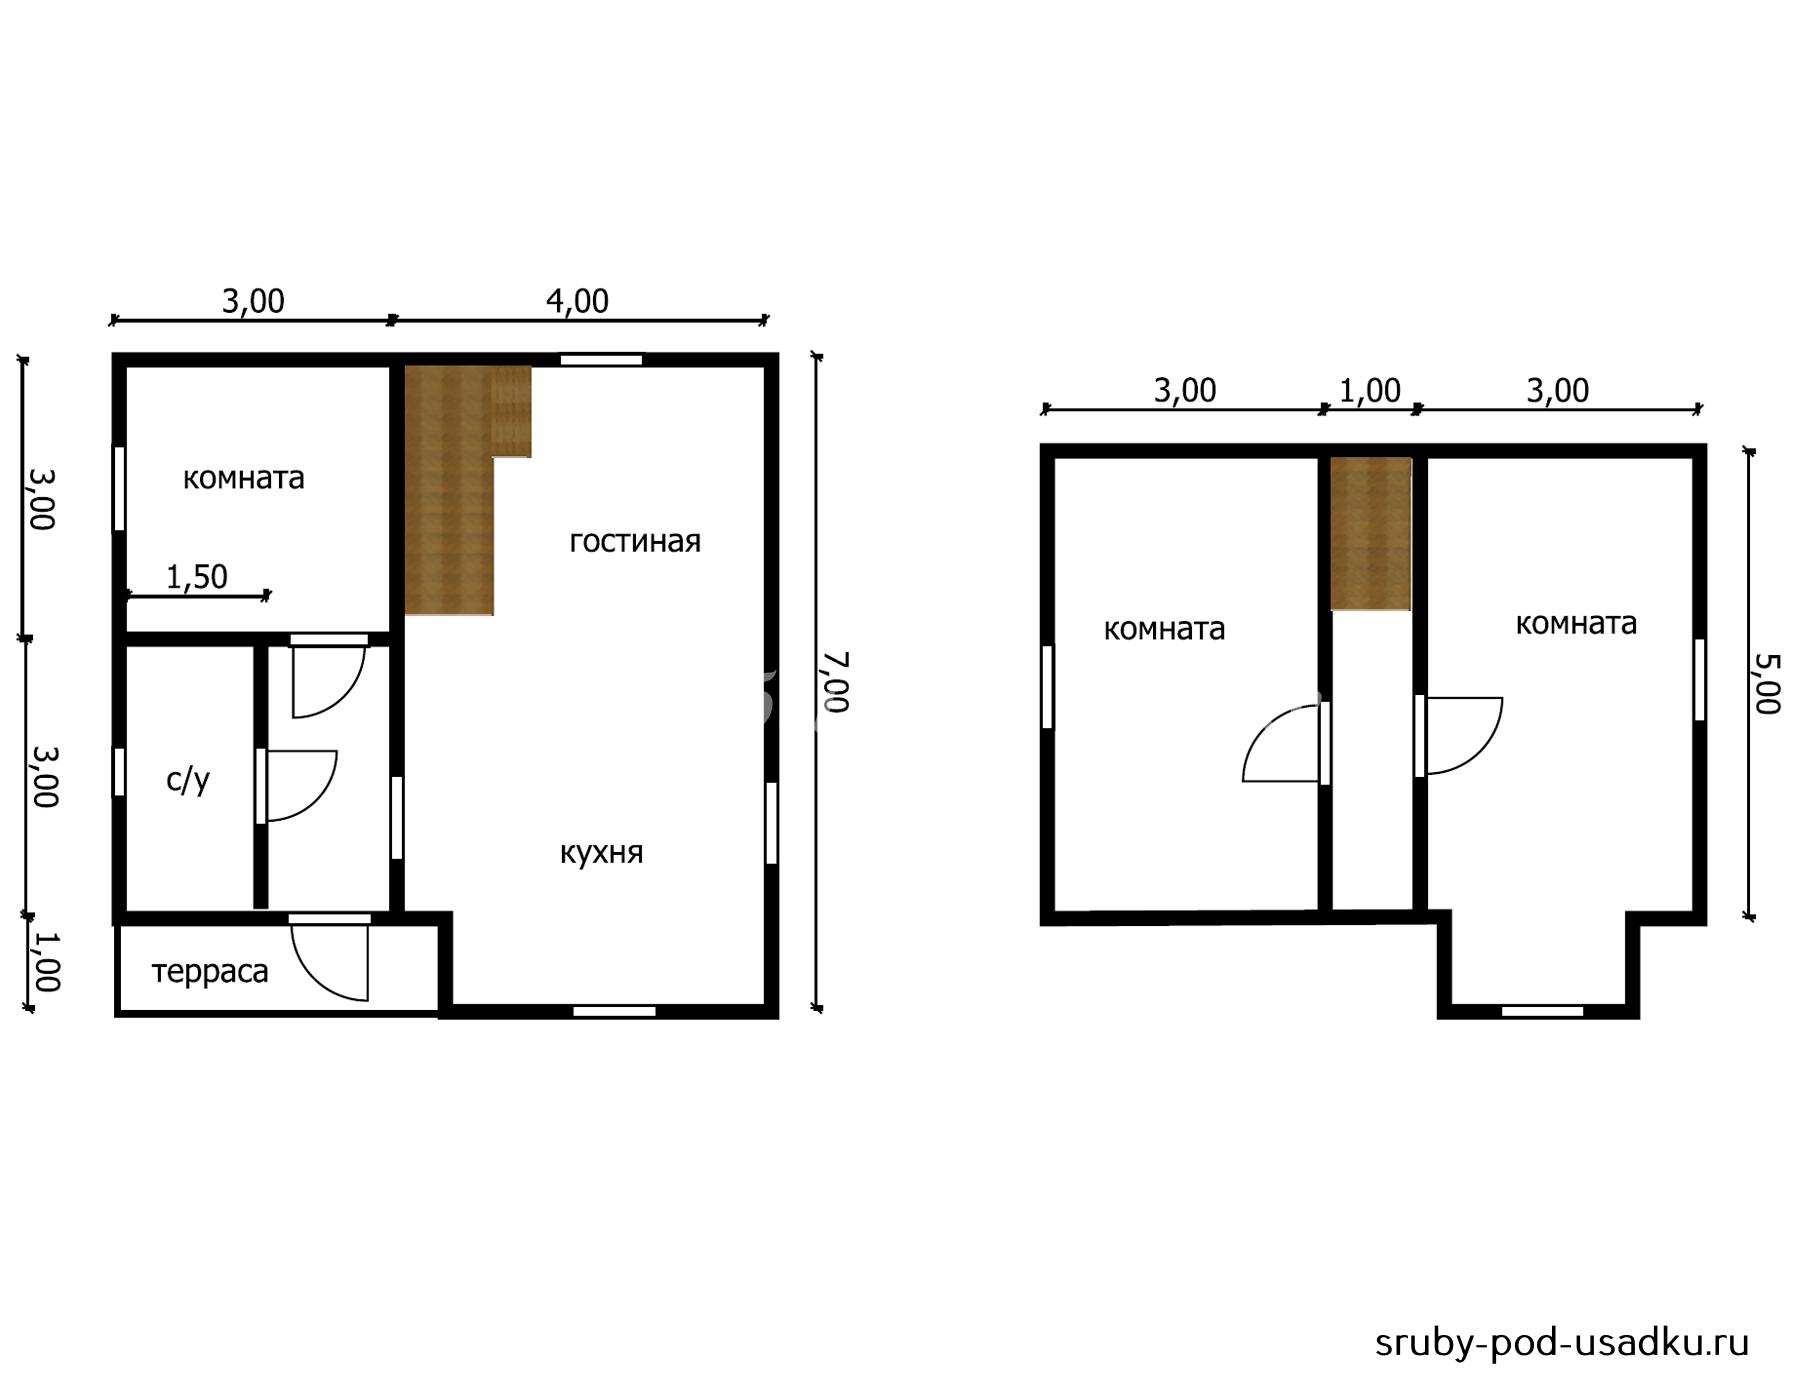 Дом из бруса под усадку 7х7 м №46 недорого